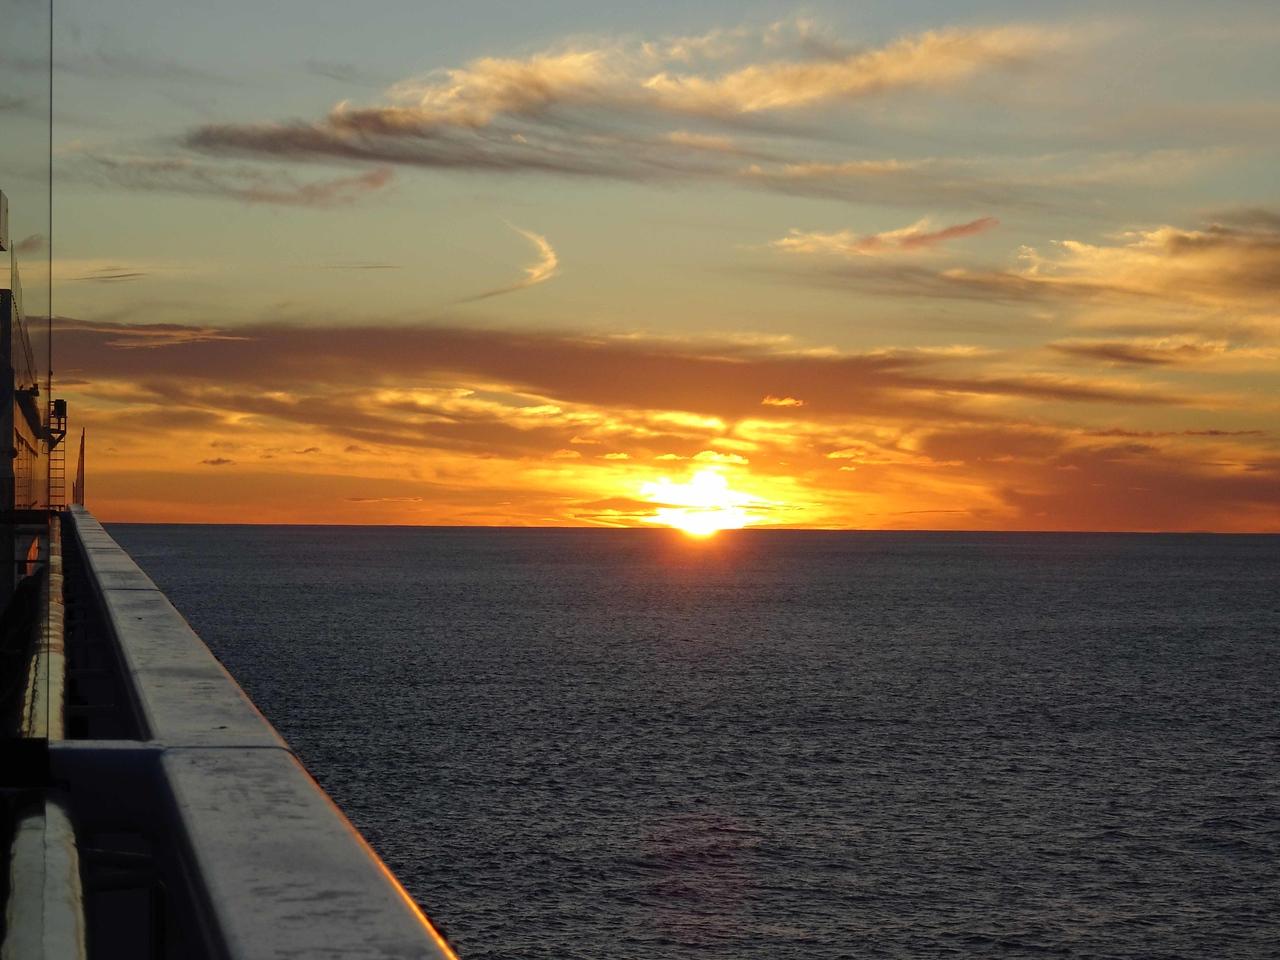 787 Sunset over the Tasmin Sea, April 11